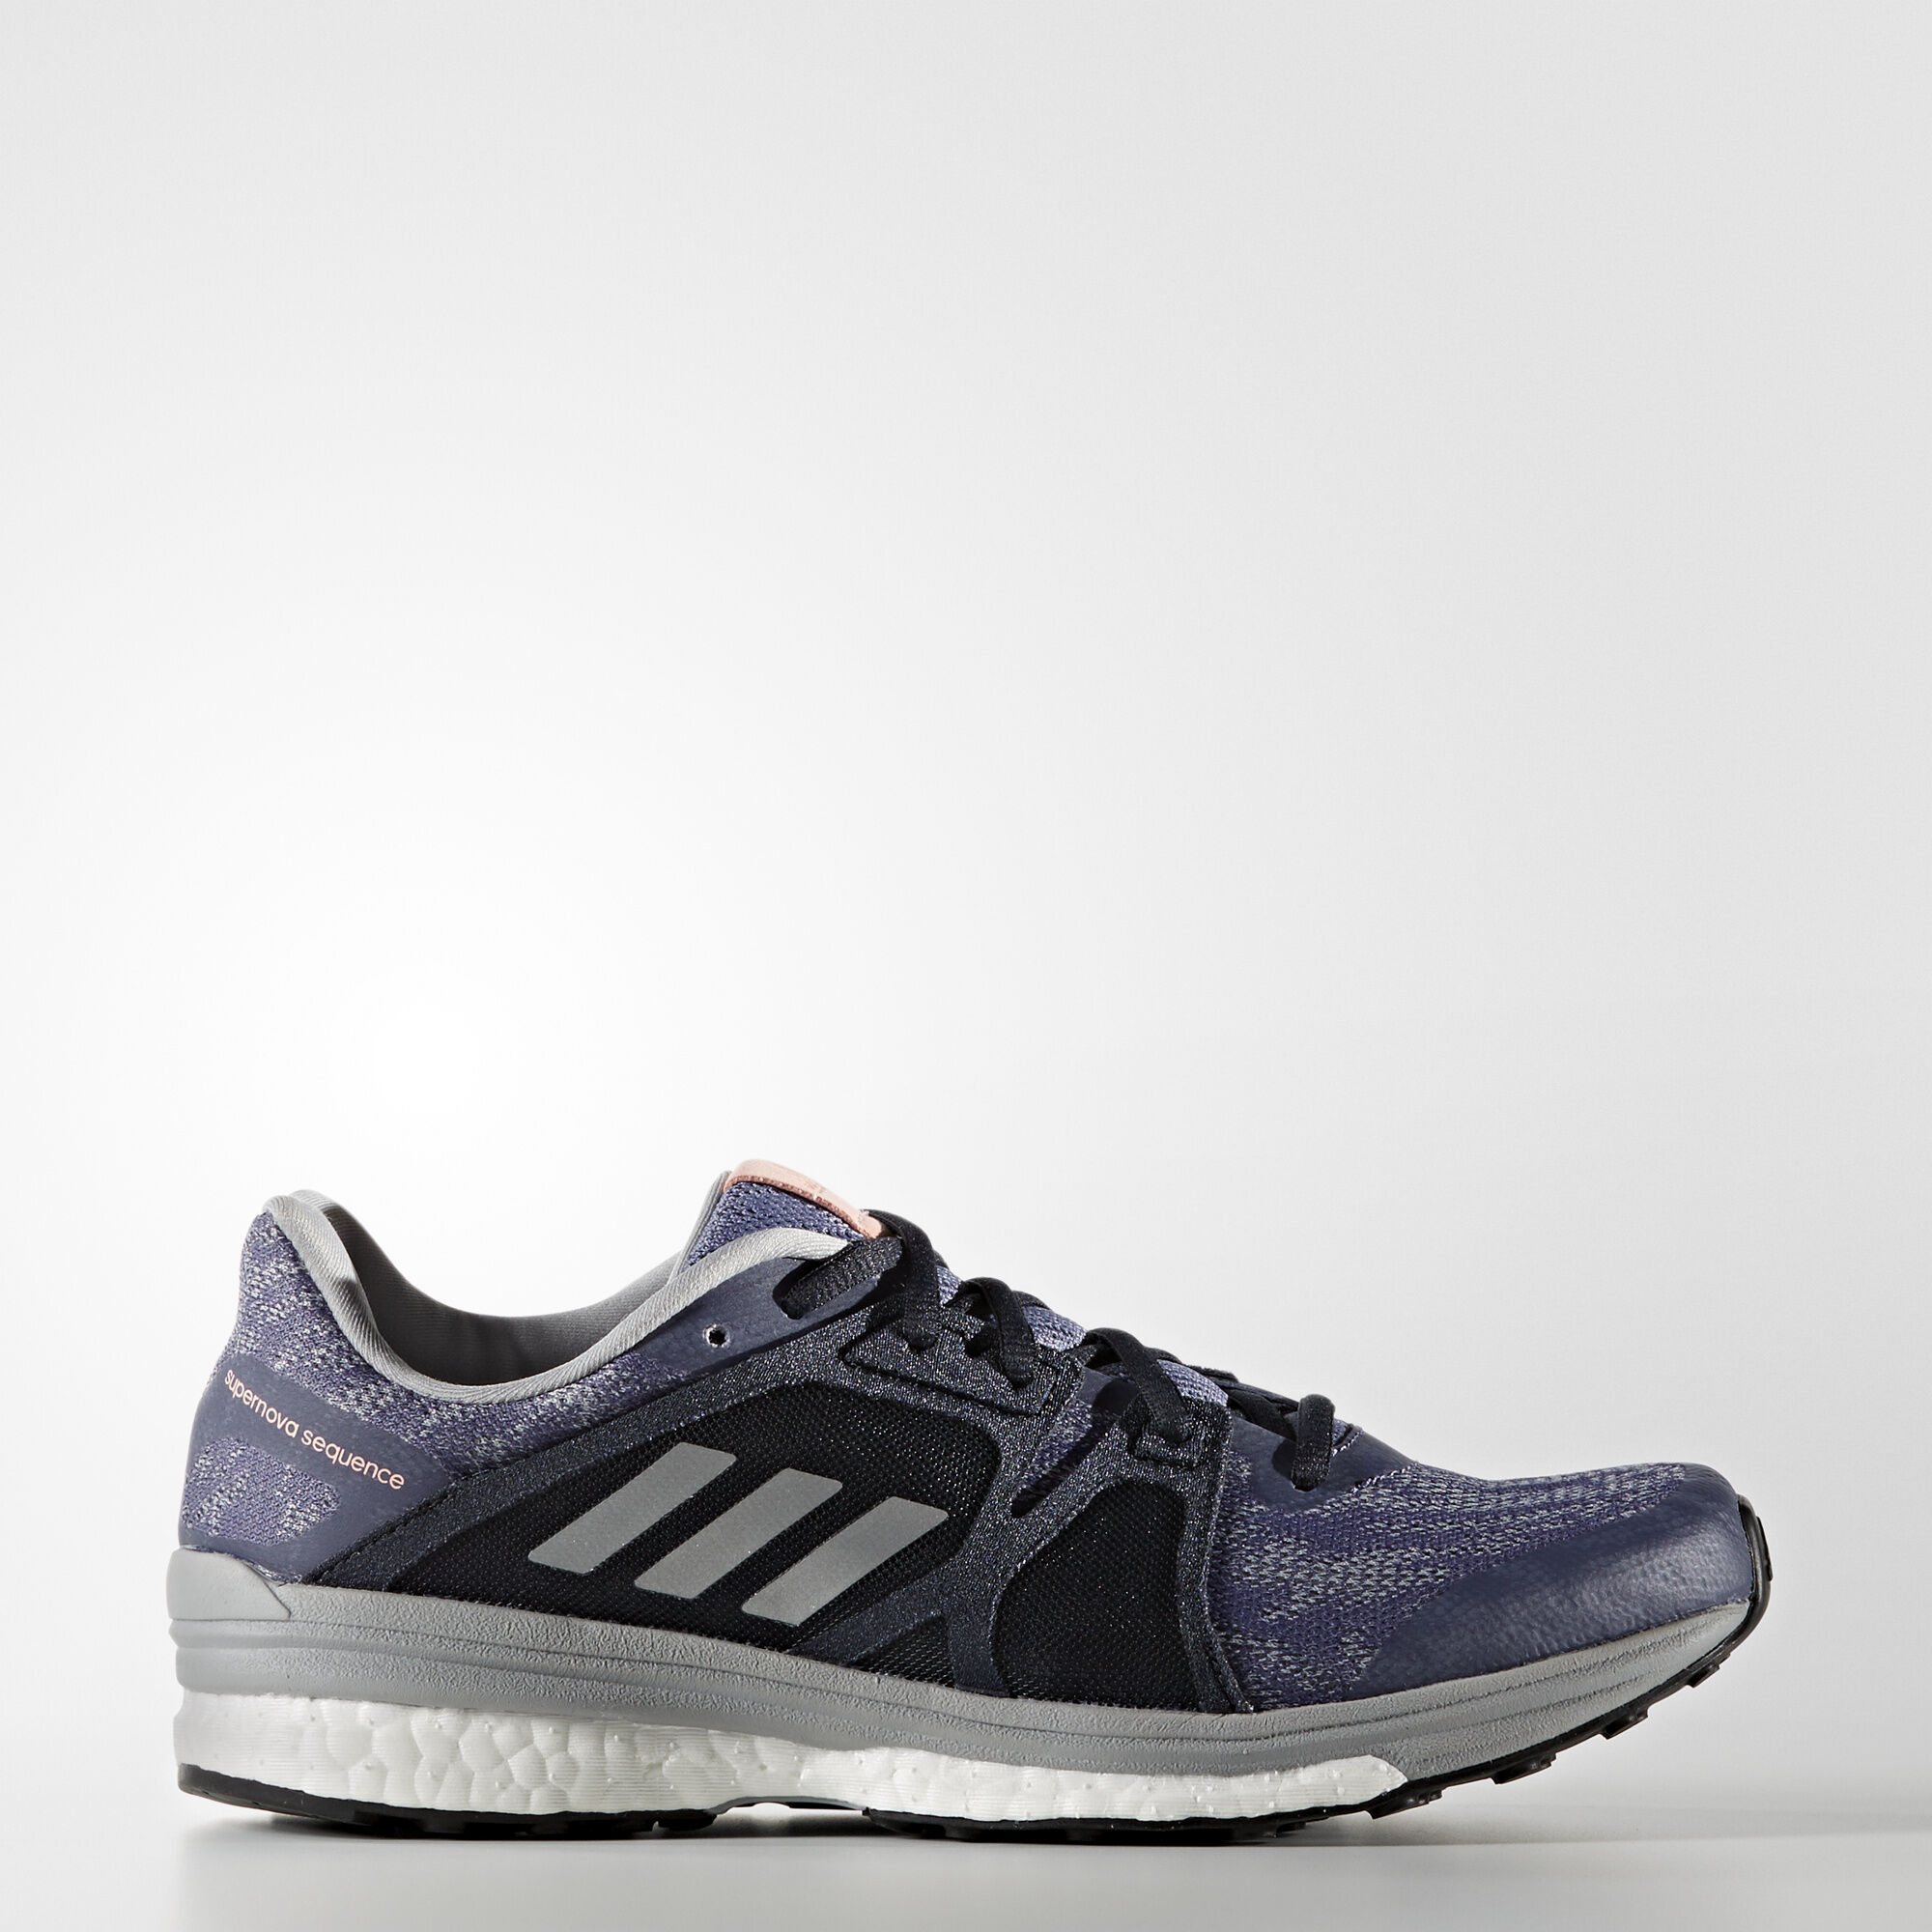 b972cb55b2d8cc adidas - Supernova Sequence 9 Shoes Super Purple Silver Metallic Mid Grey  BB1617. Women Running